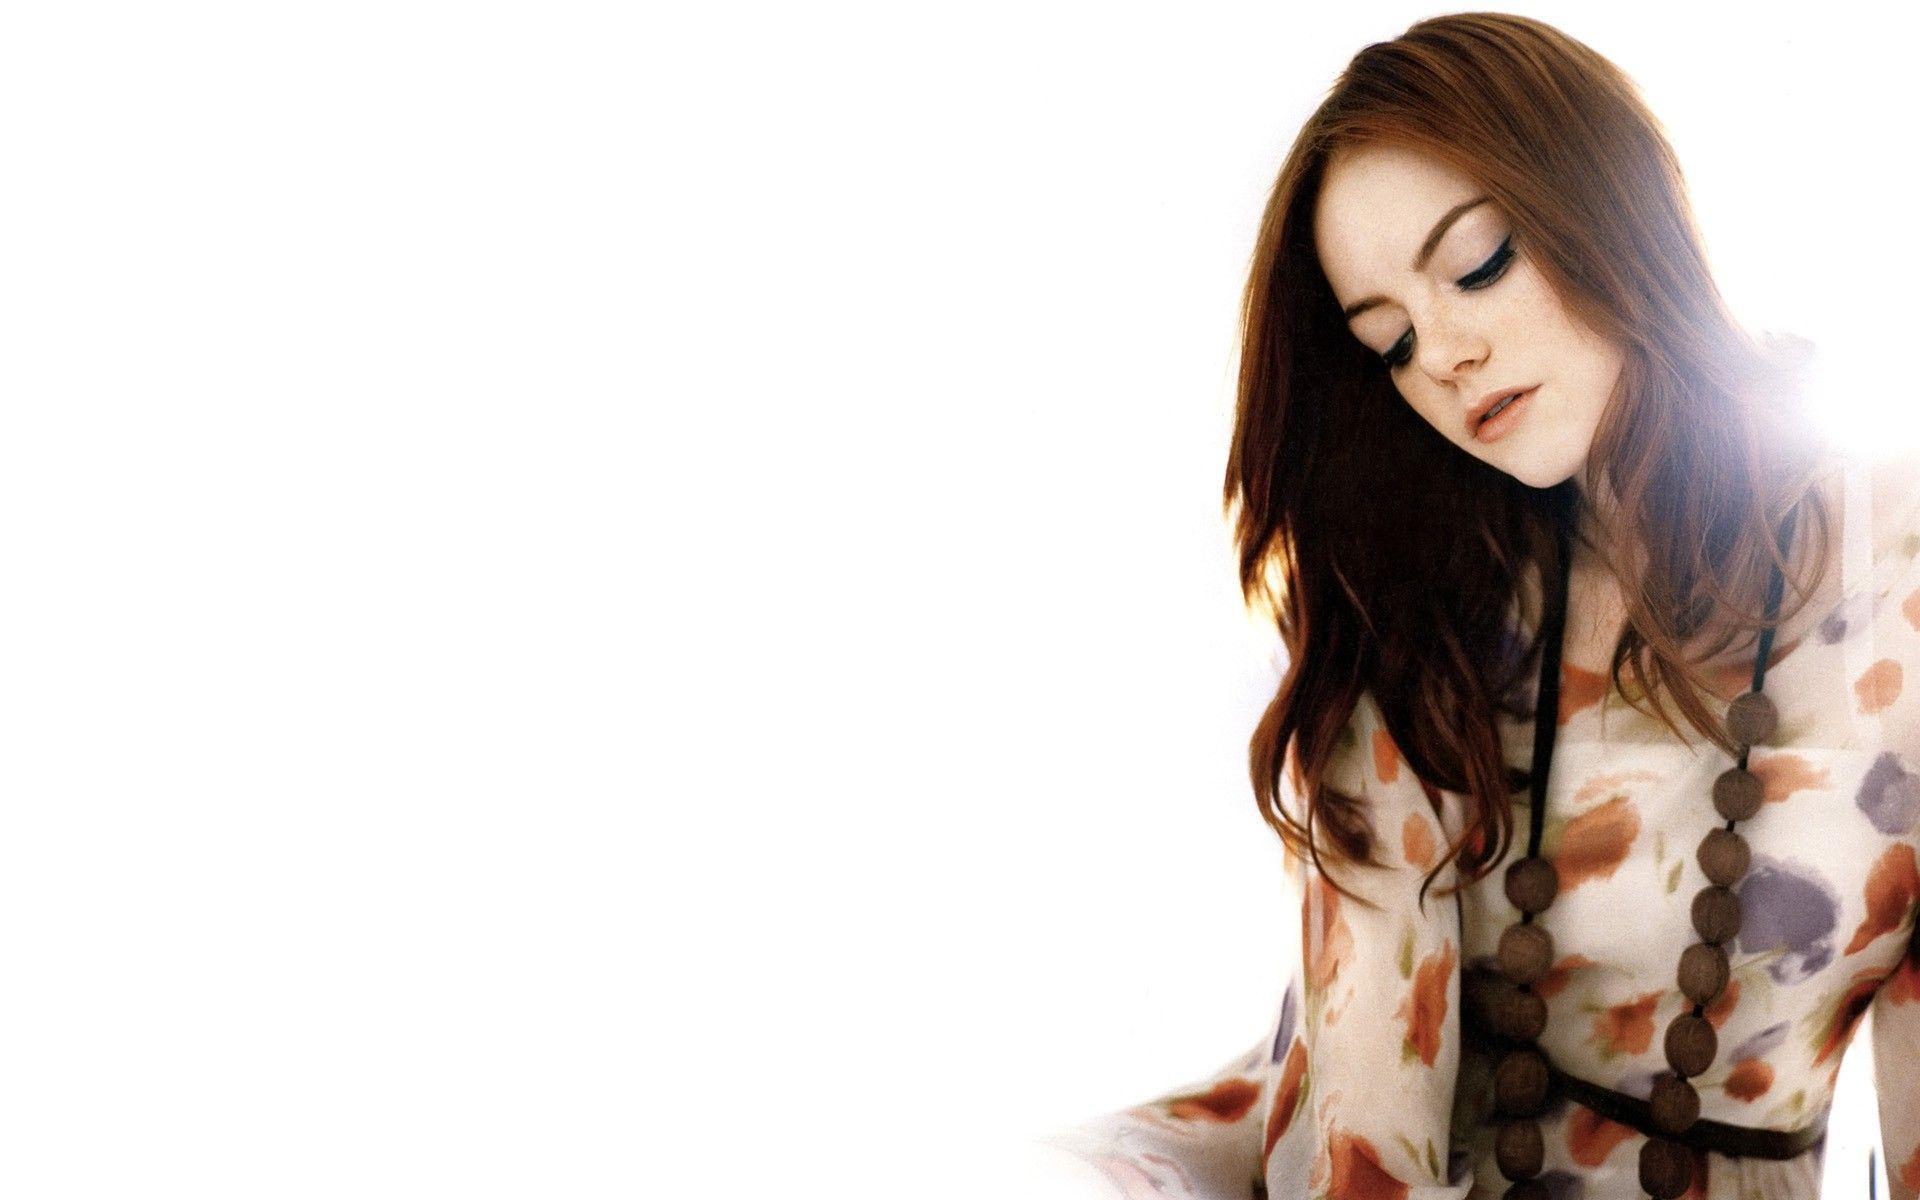 Emma Stone Gallery Wallpaper - Celebrities Powericare.